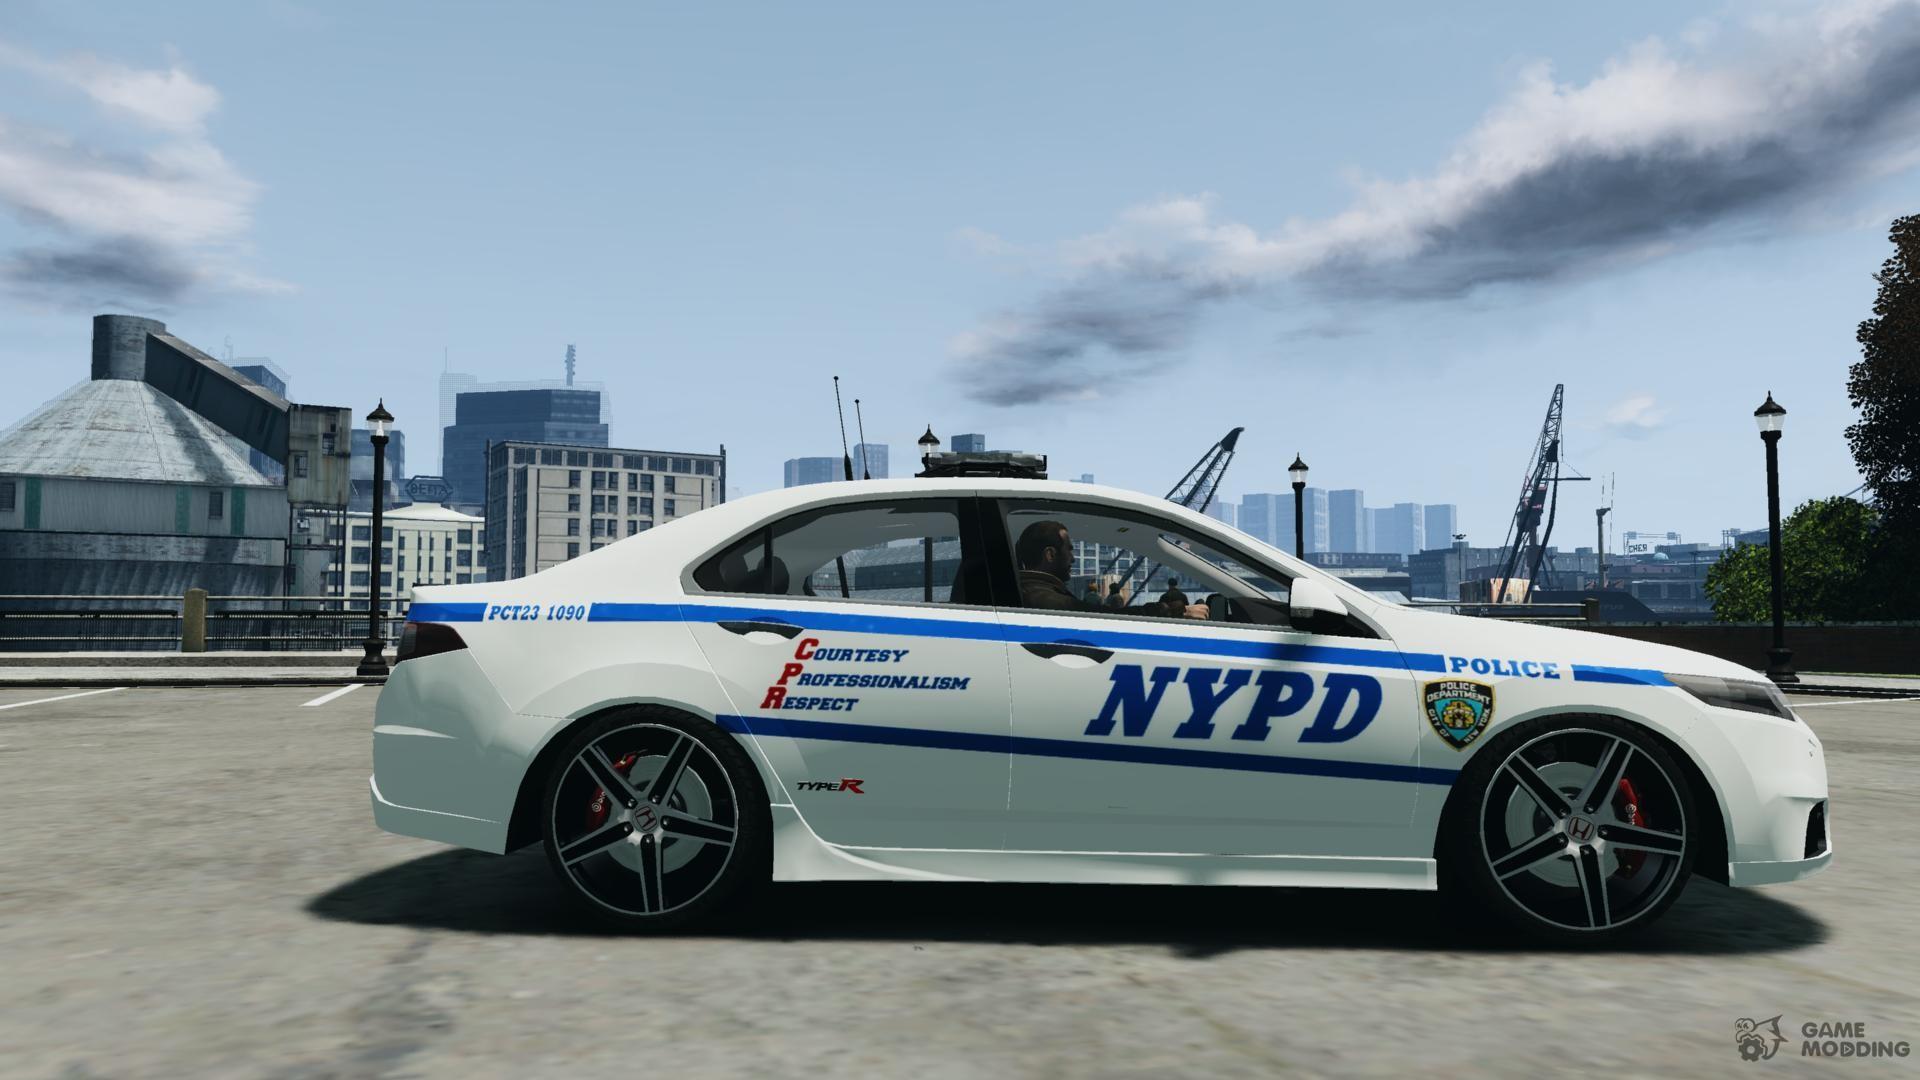 honda accord type r nypd city patrol 1090 for gta 4. Black Bedroom Furniture Sets. Home Design Ideas